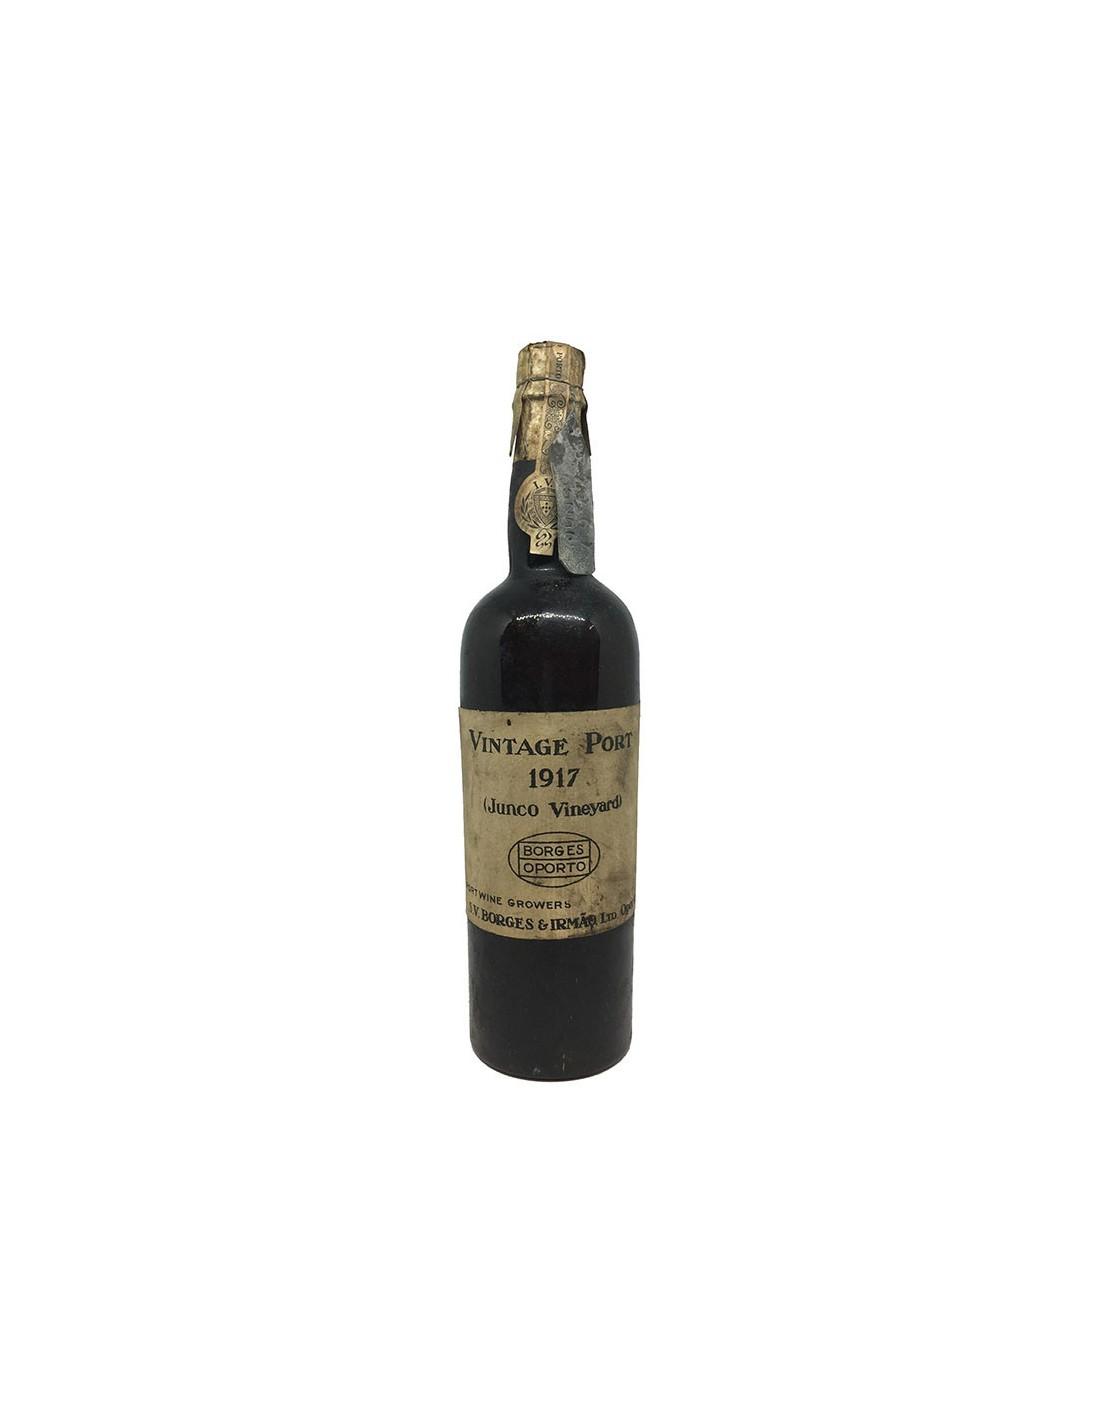 Vintage Porto Junco 1917 BORGES & IRMAO GRANDI BOTTIGLIE